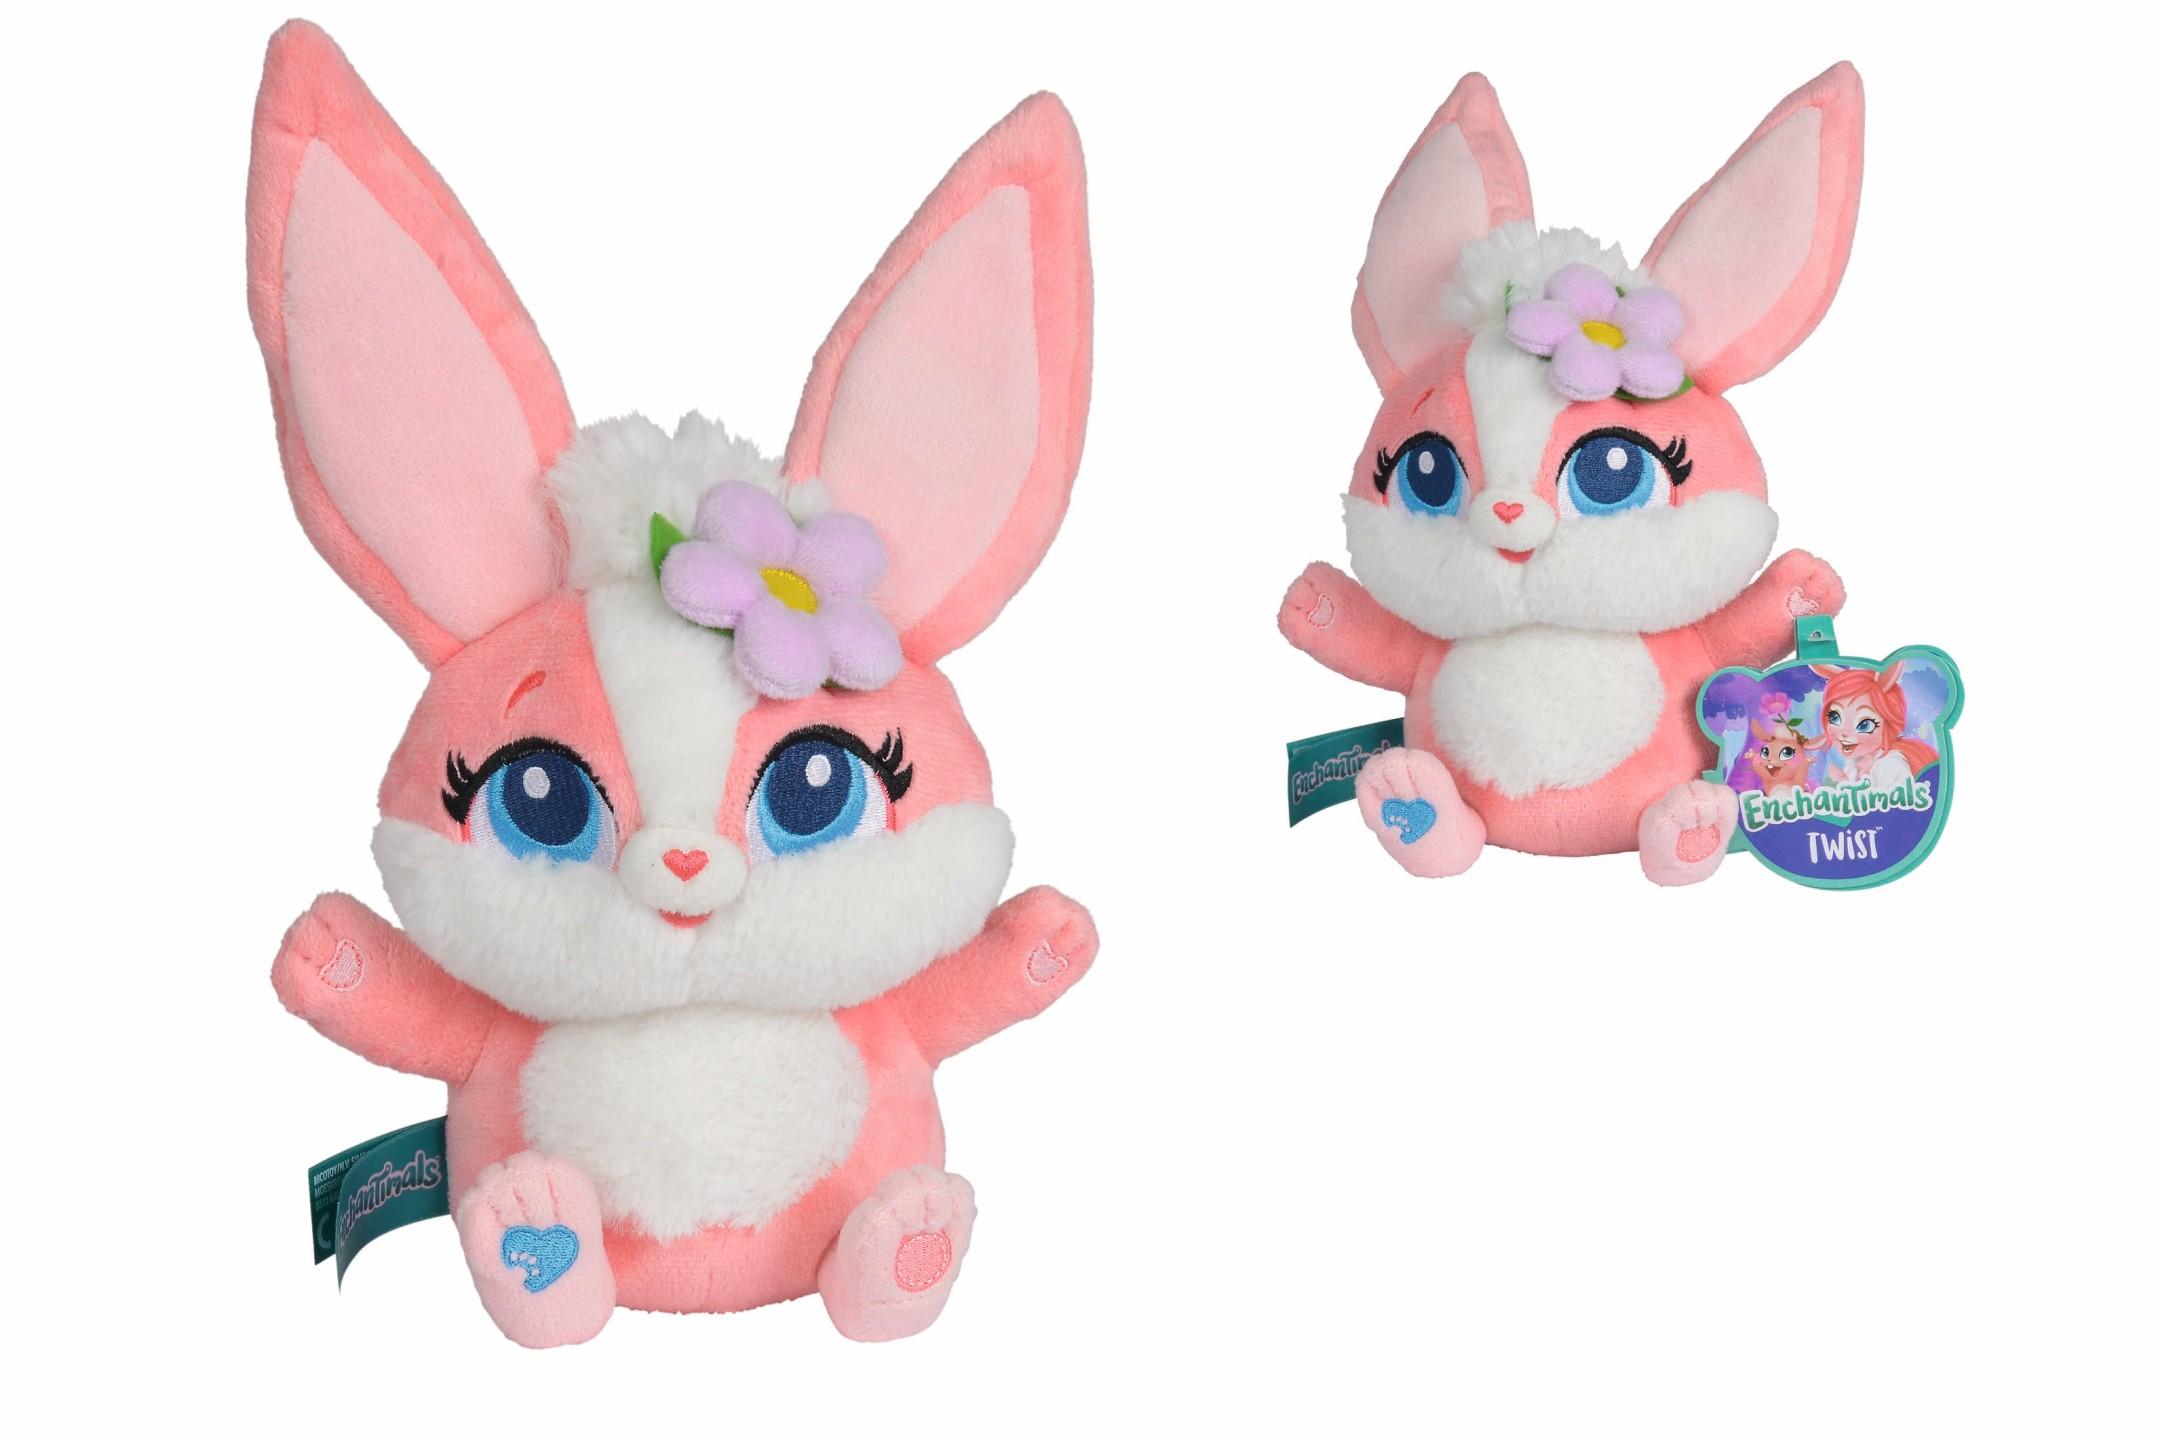 Enchantimals Bunny Twist 35 cm